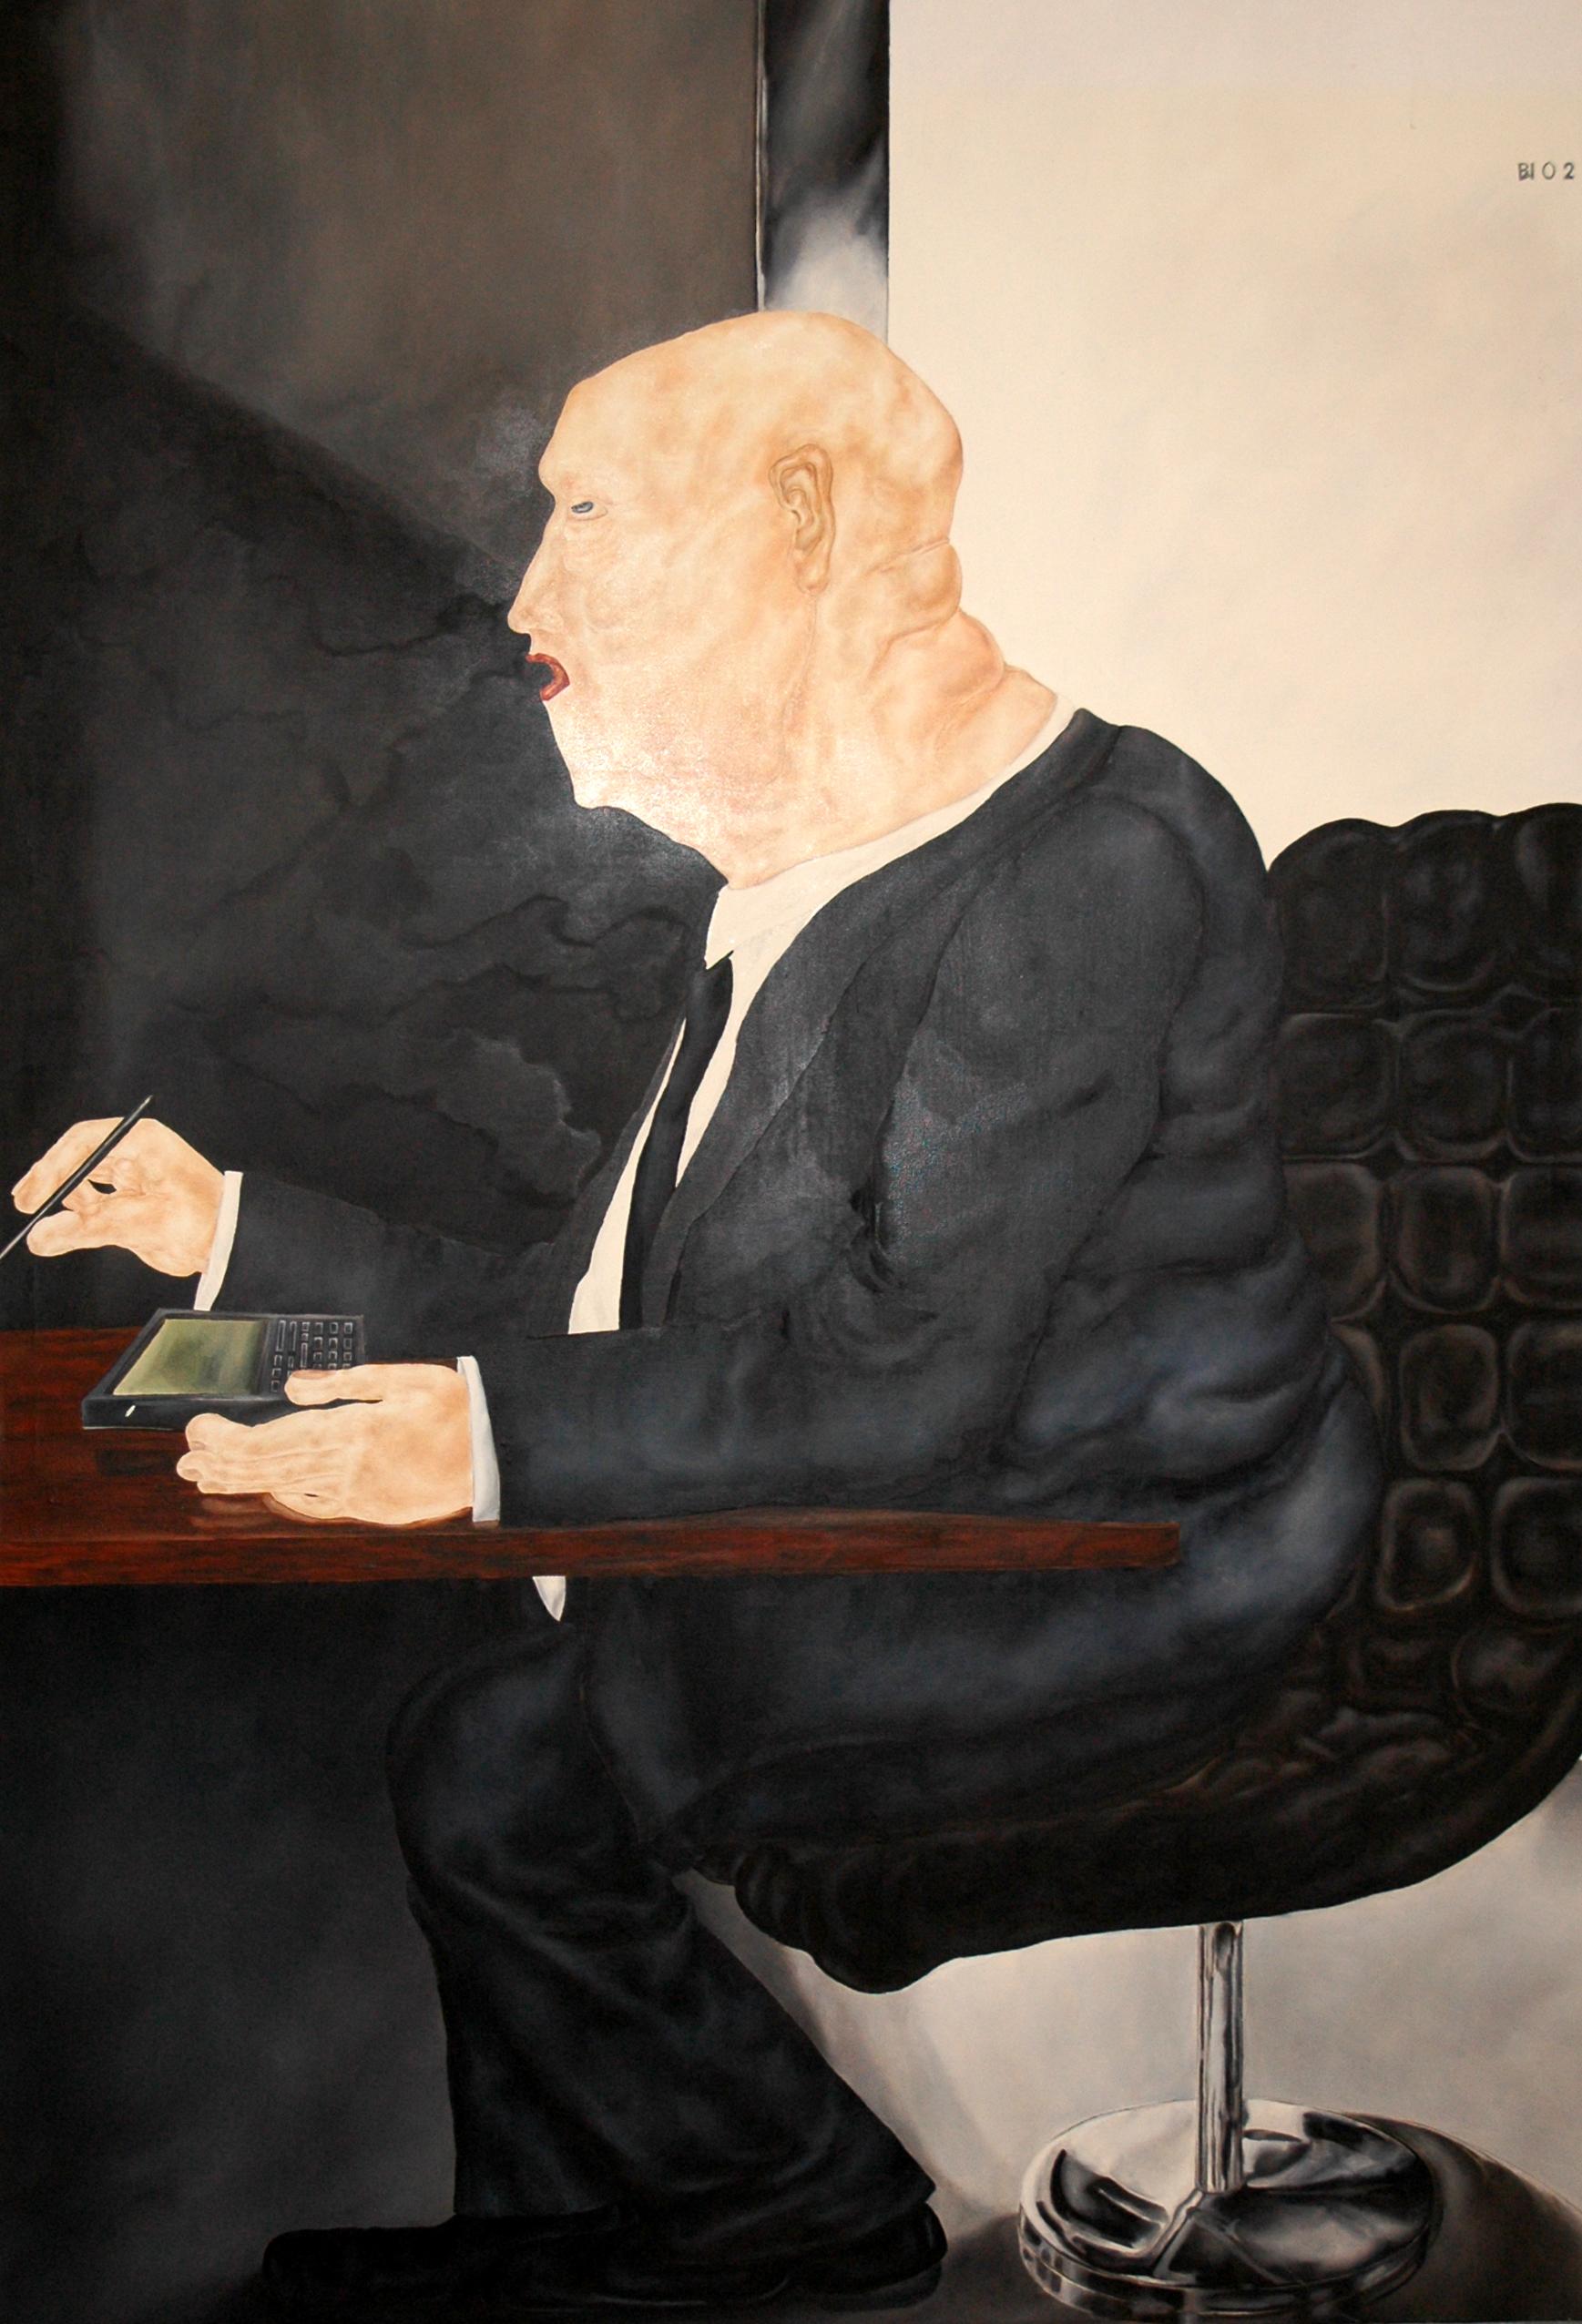 Öl auf Leinwand, 2002, 210 cm x 140 cm      2900 €